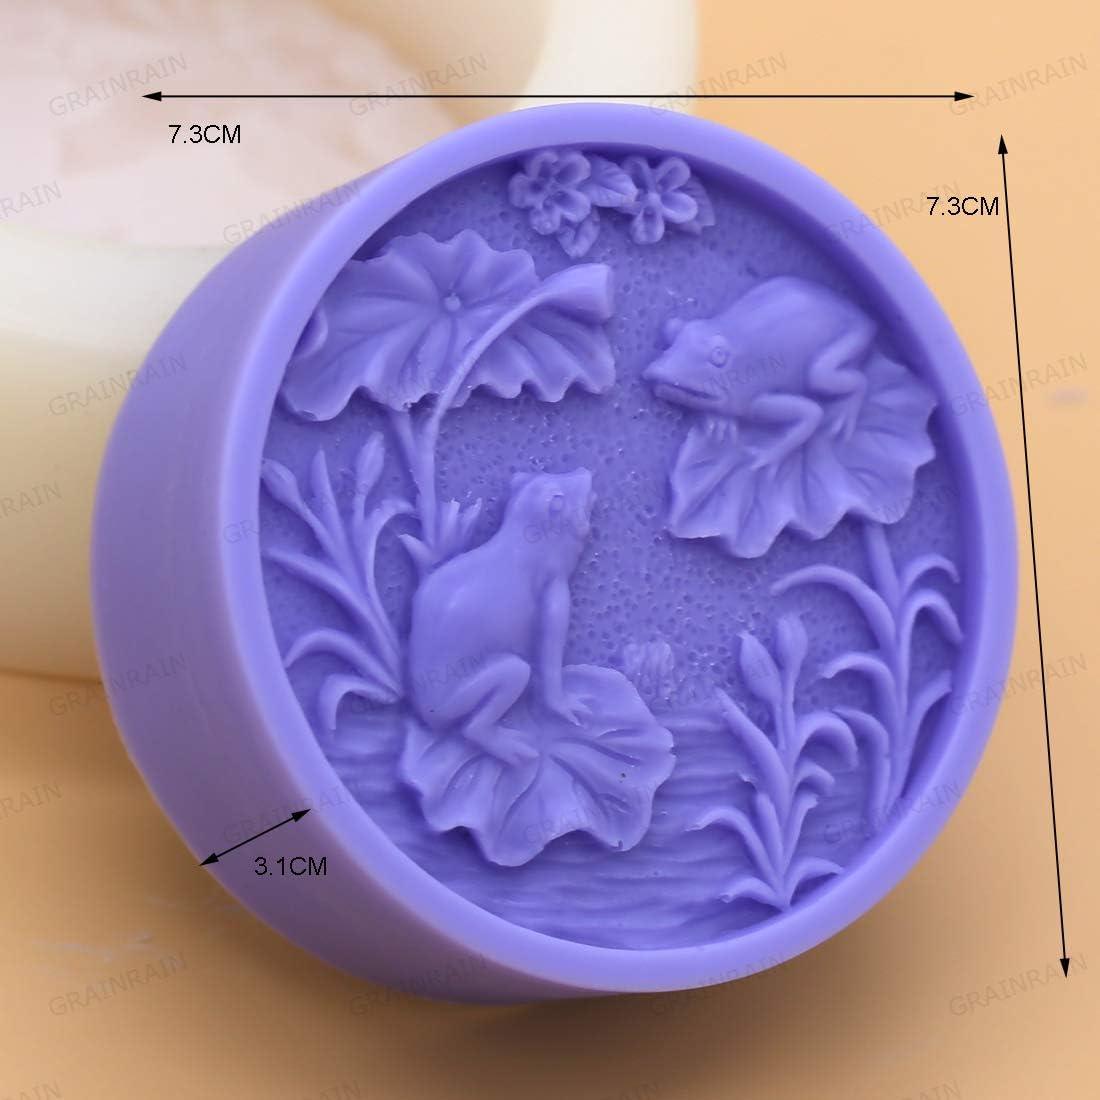 alpha-ene.co.jp Arts, Crafts & Sewing Molds 11043 Craft Art ...